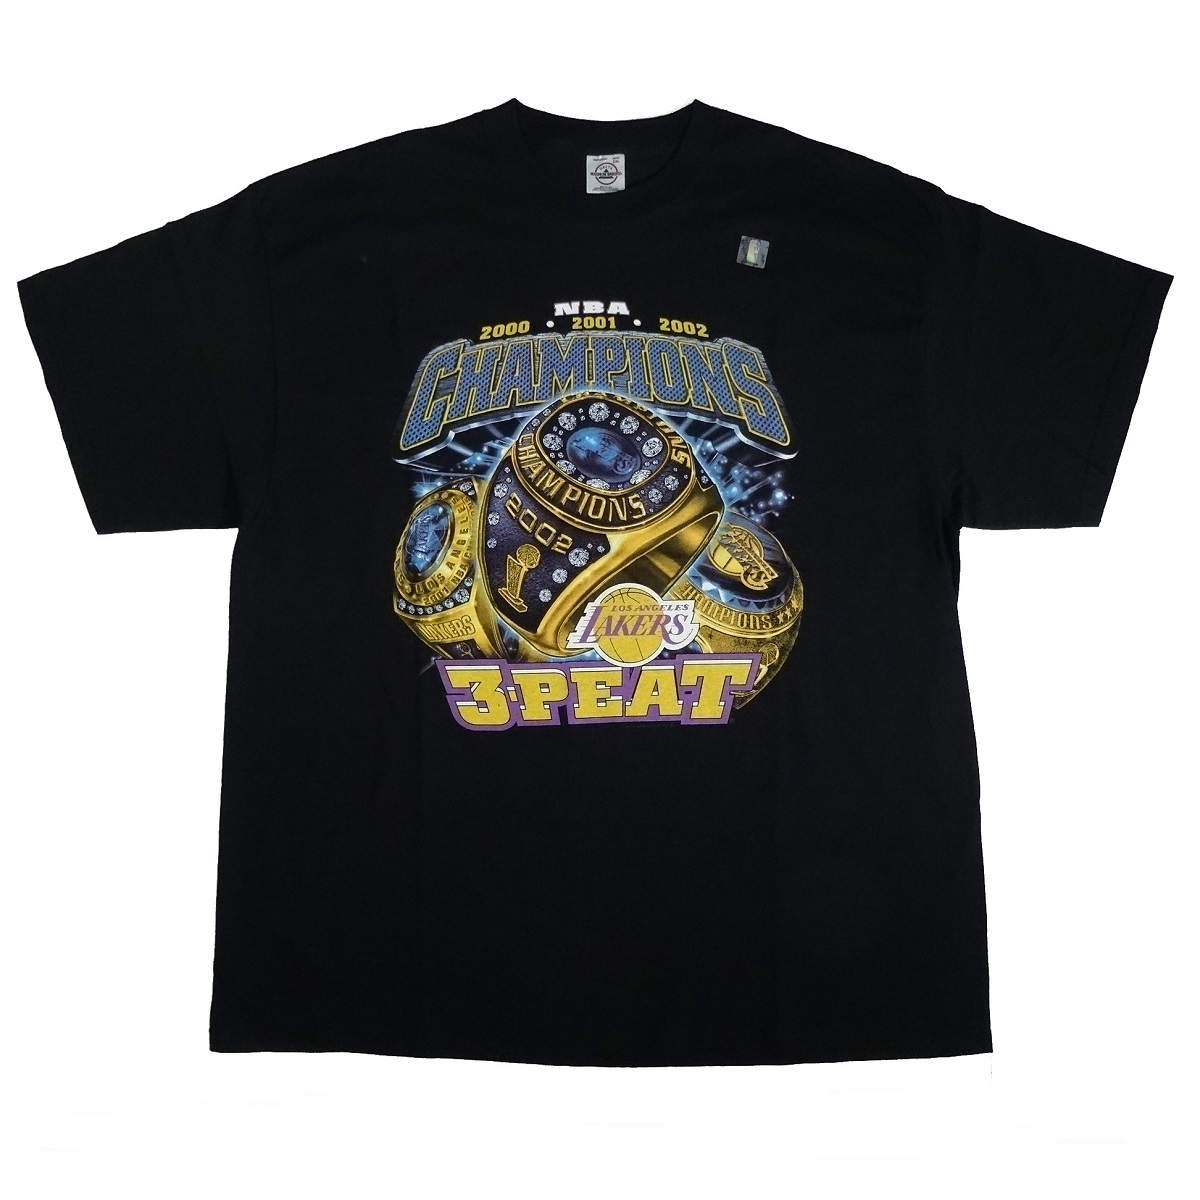 los angeles lakers 3 peat nba champions t shirt front of shirt